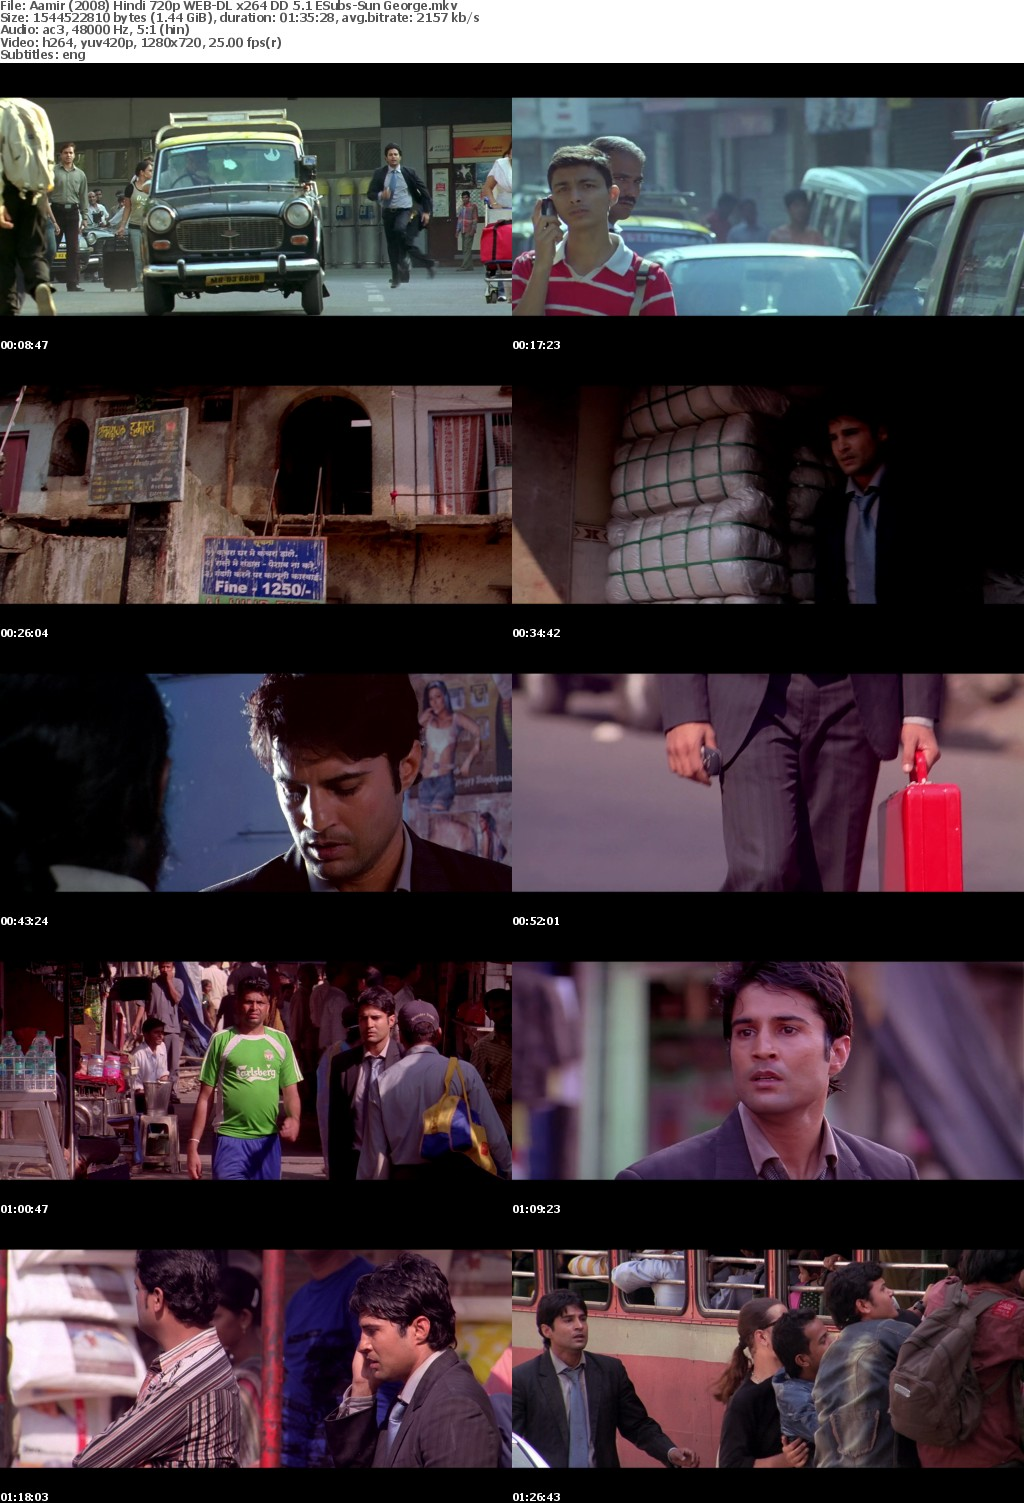 Aamir (2008) Hindi 720p WEB-DL x264 DD 5.1 ESubs-Sun George